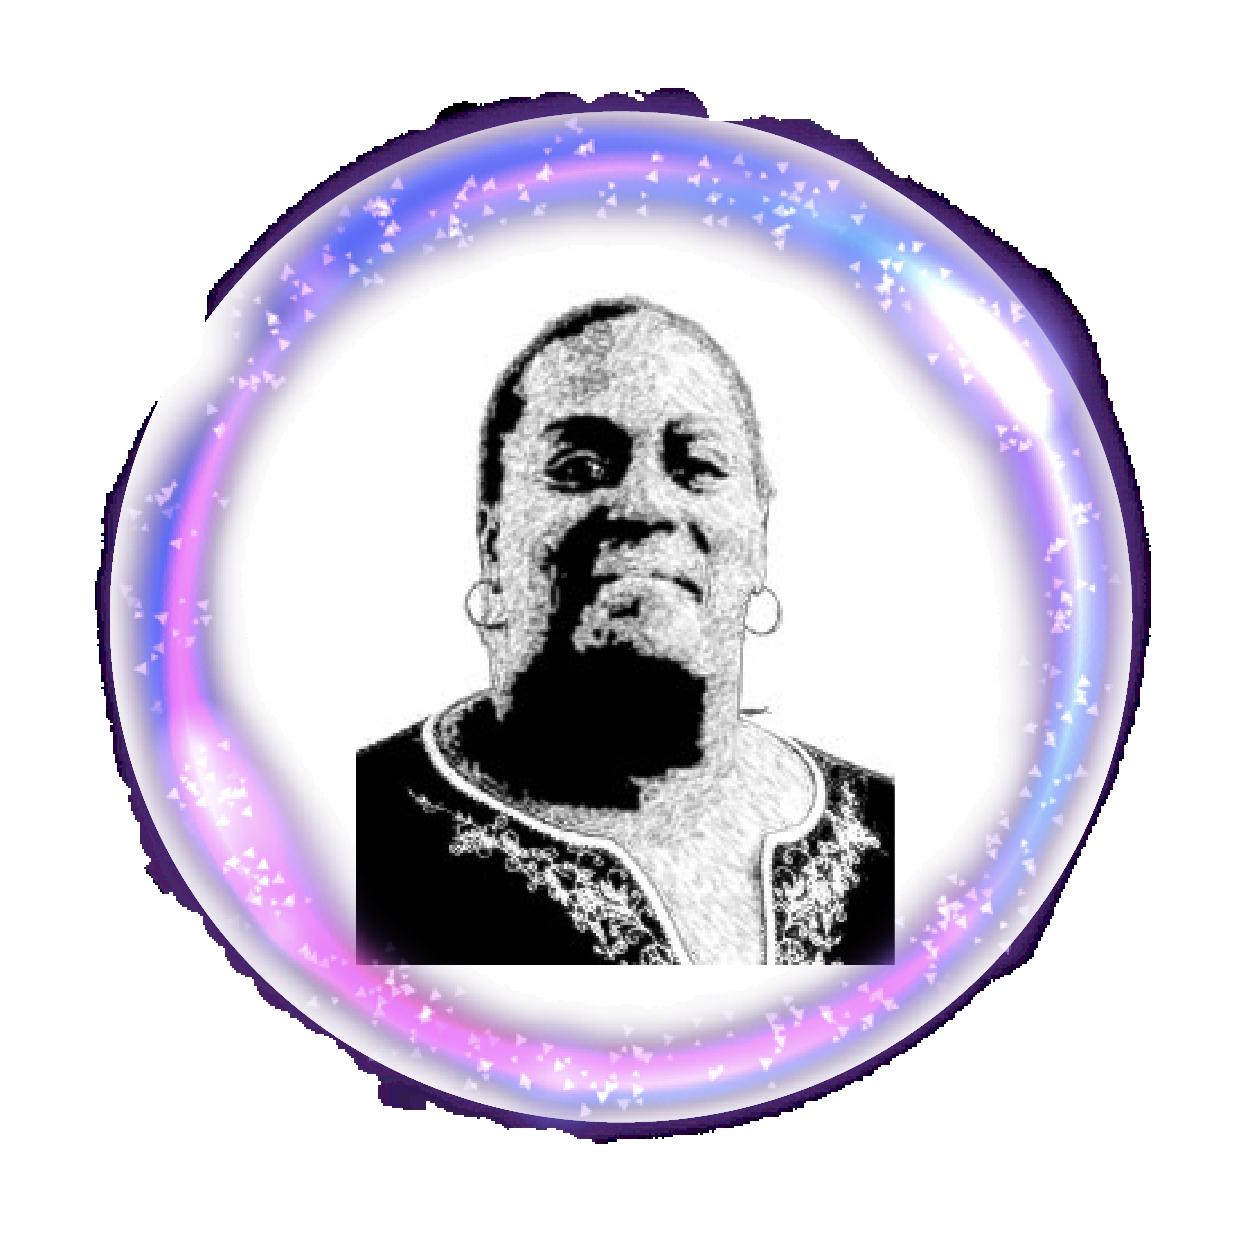 Minister Bobbie Jean BakerMemorial Fund - The Minister Bobbie Jean Baker Memorial Fund supports the Minister Bobbie Jean Baker Memorial Award and the leadership of Transgender women of color.